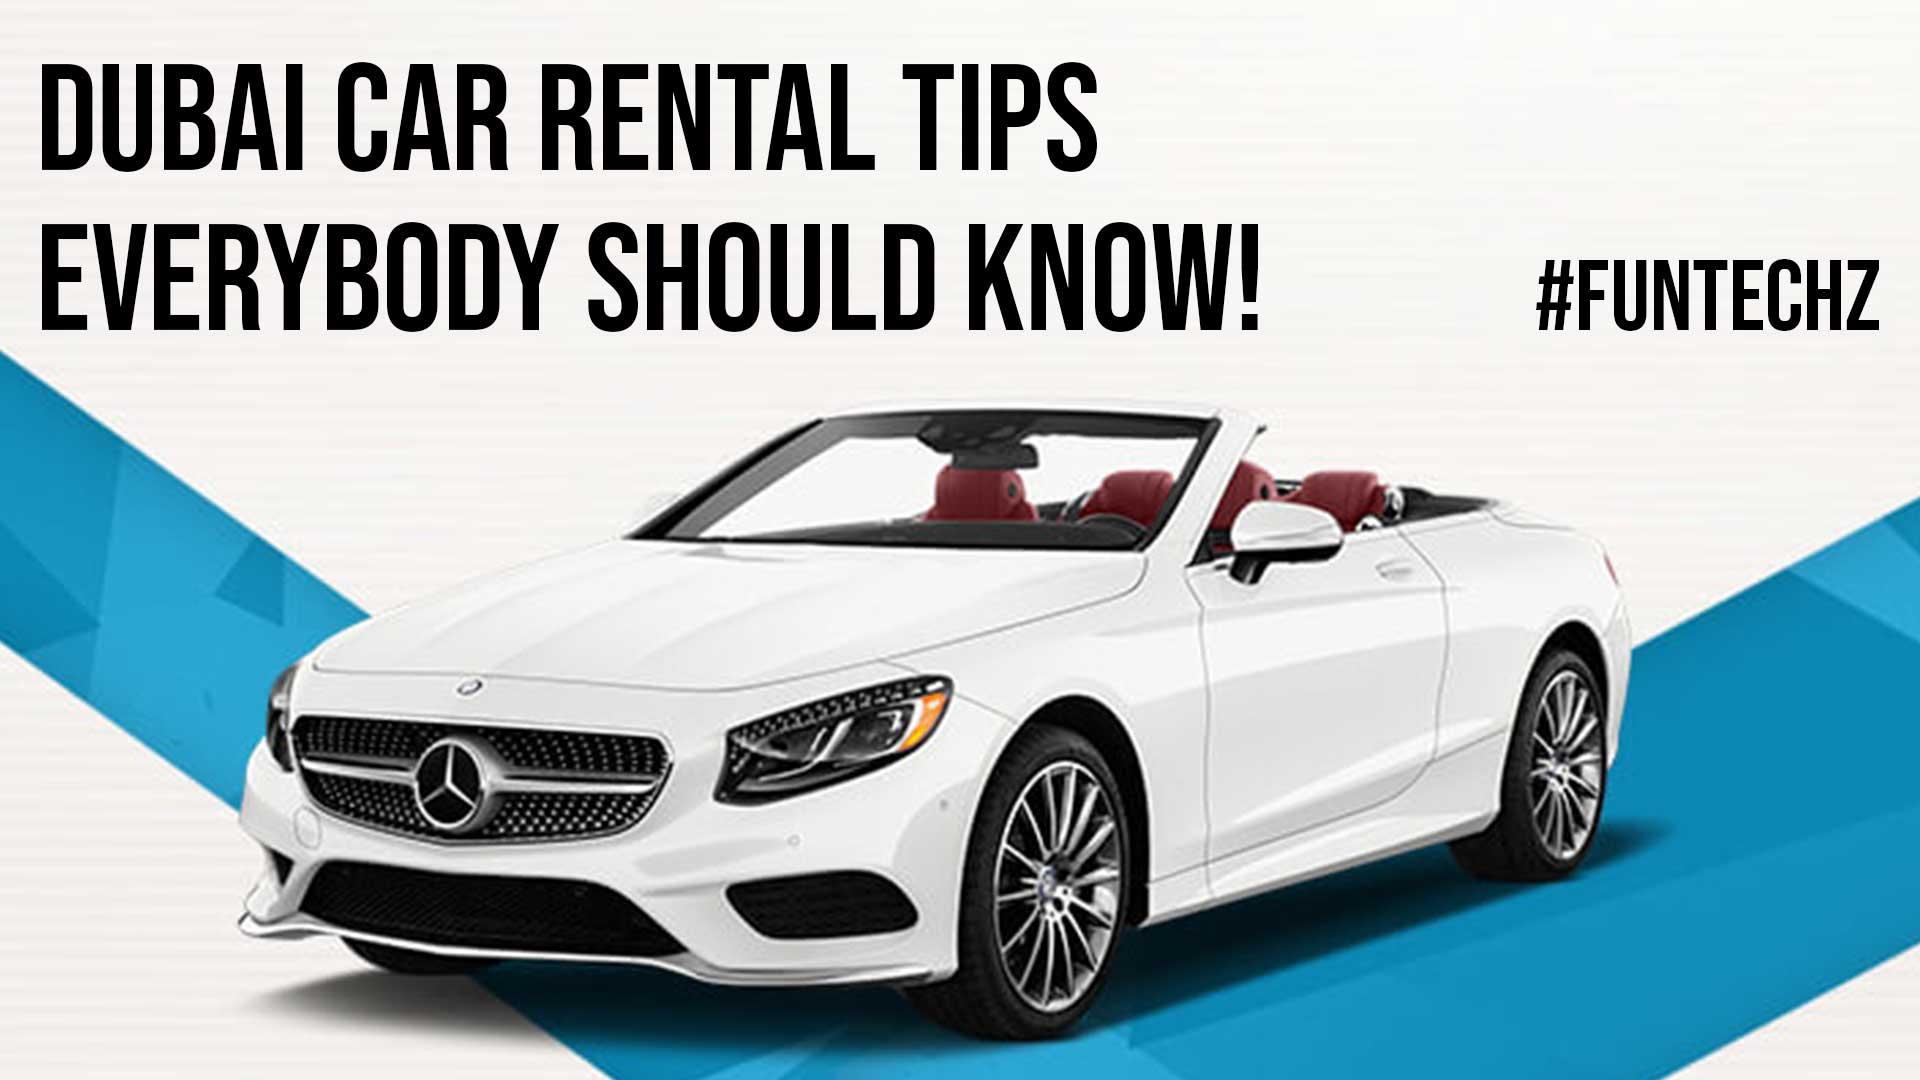 Dubai Car Rental Tips Everybody Should Know